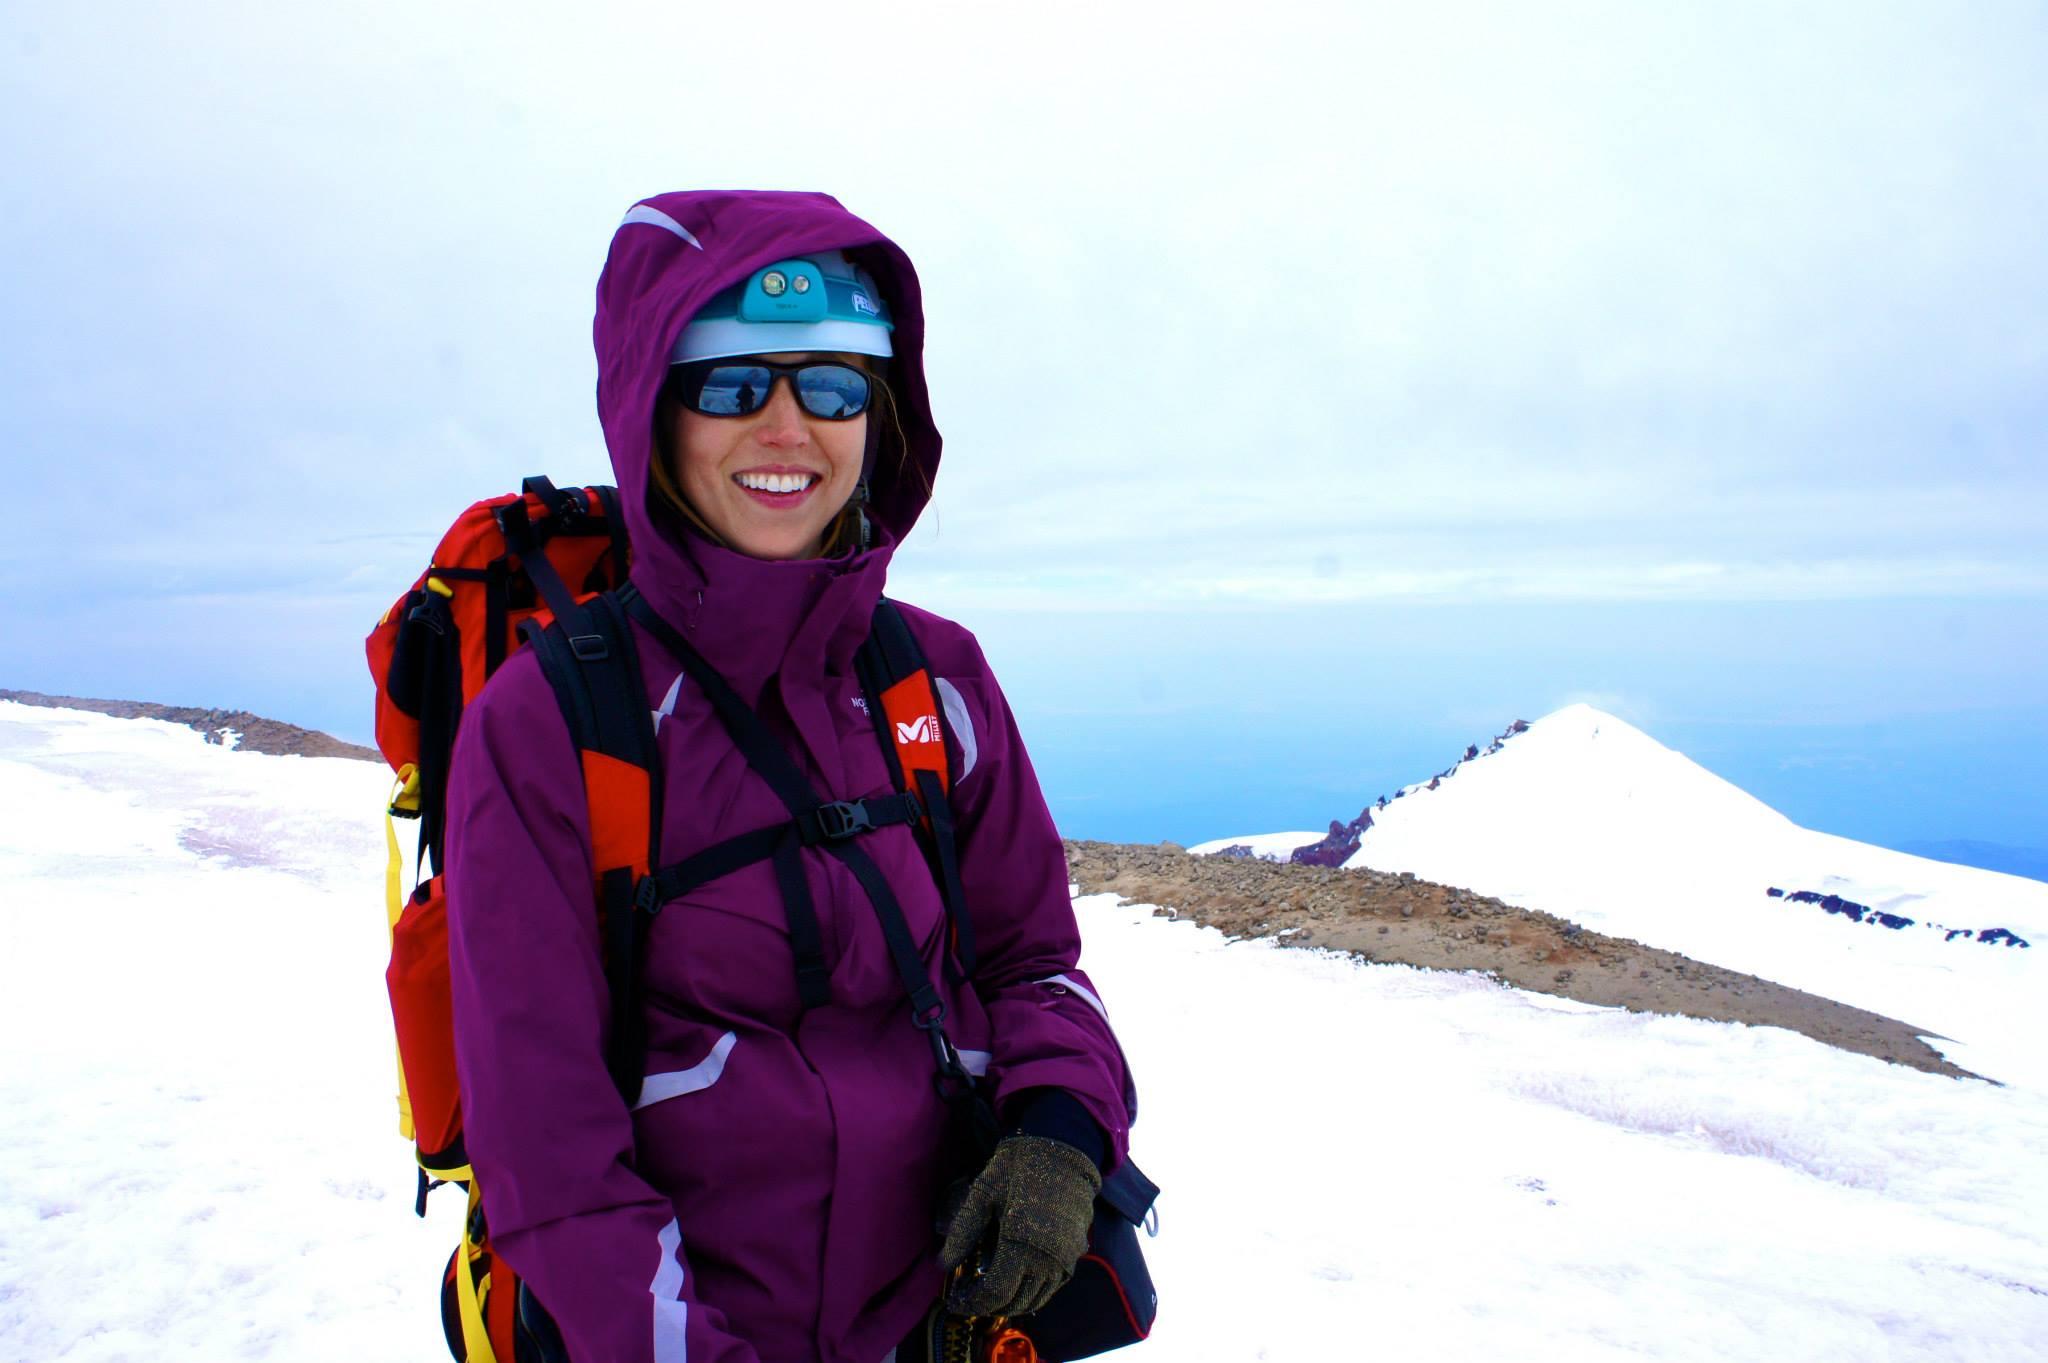 On the summit of Mt. Rainier.